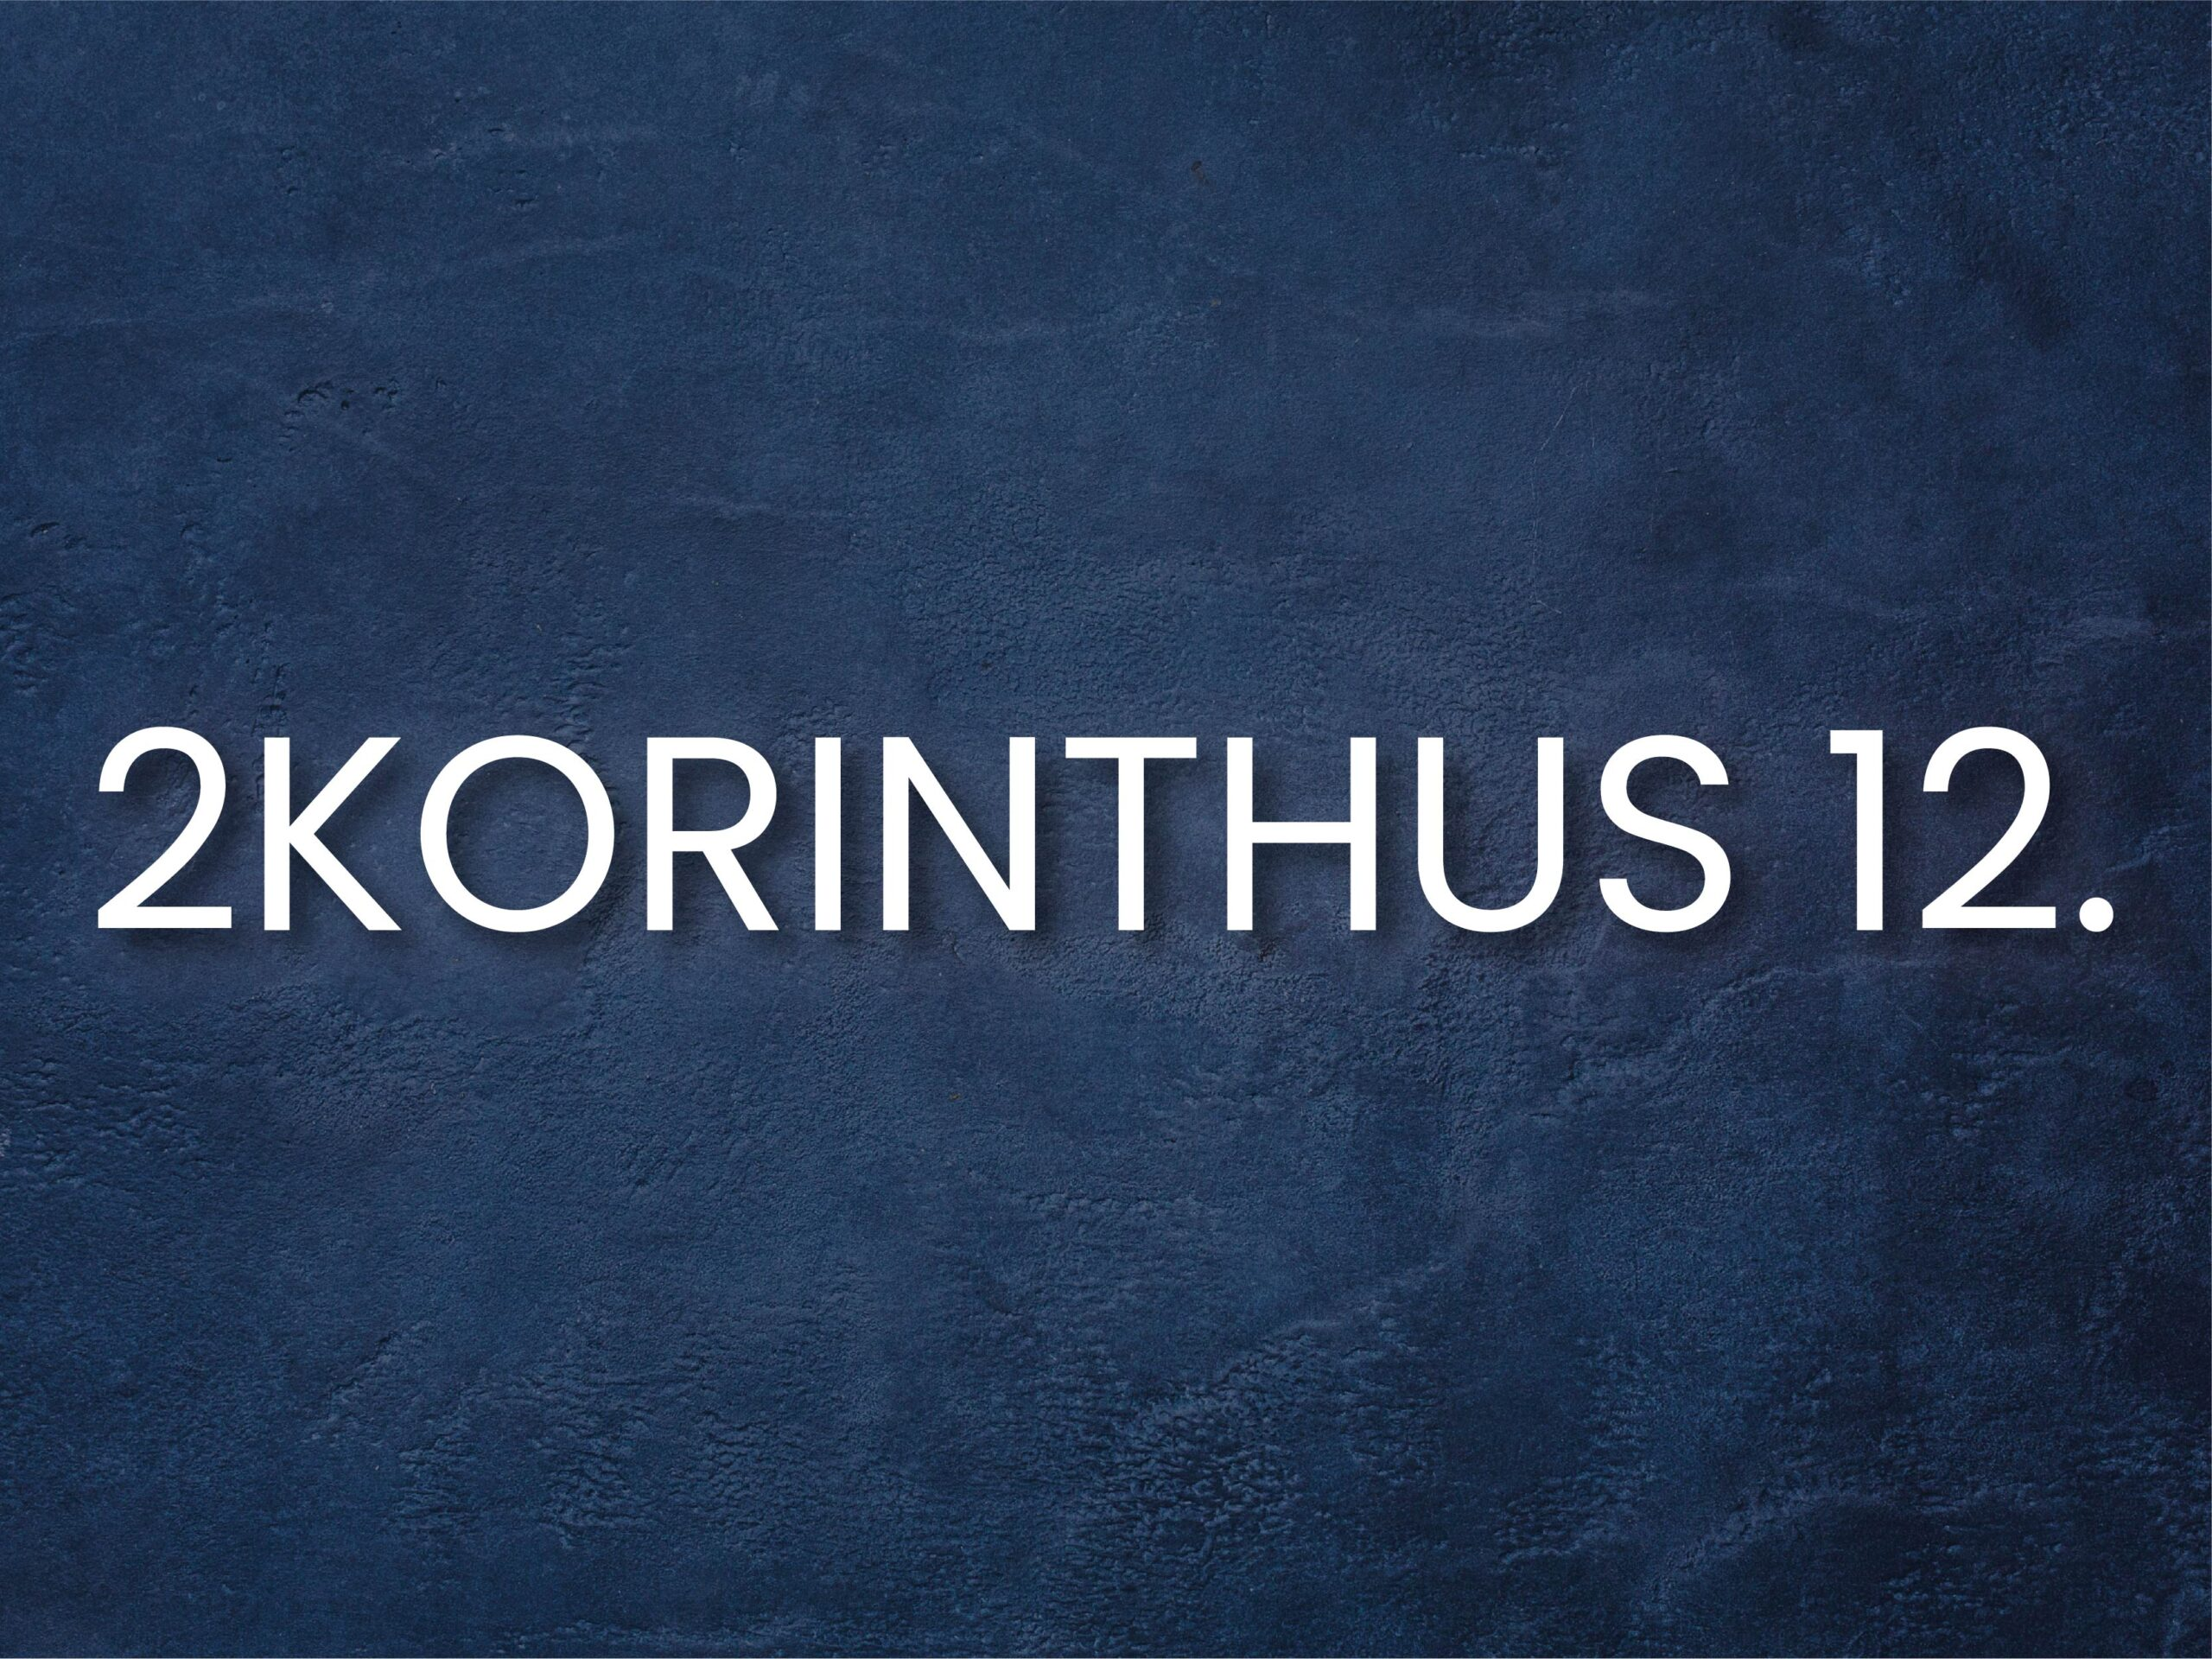 INFO_2korinthus_12